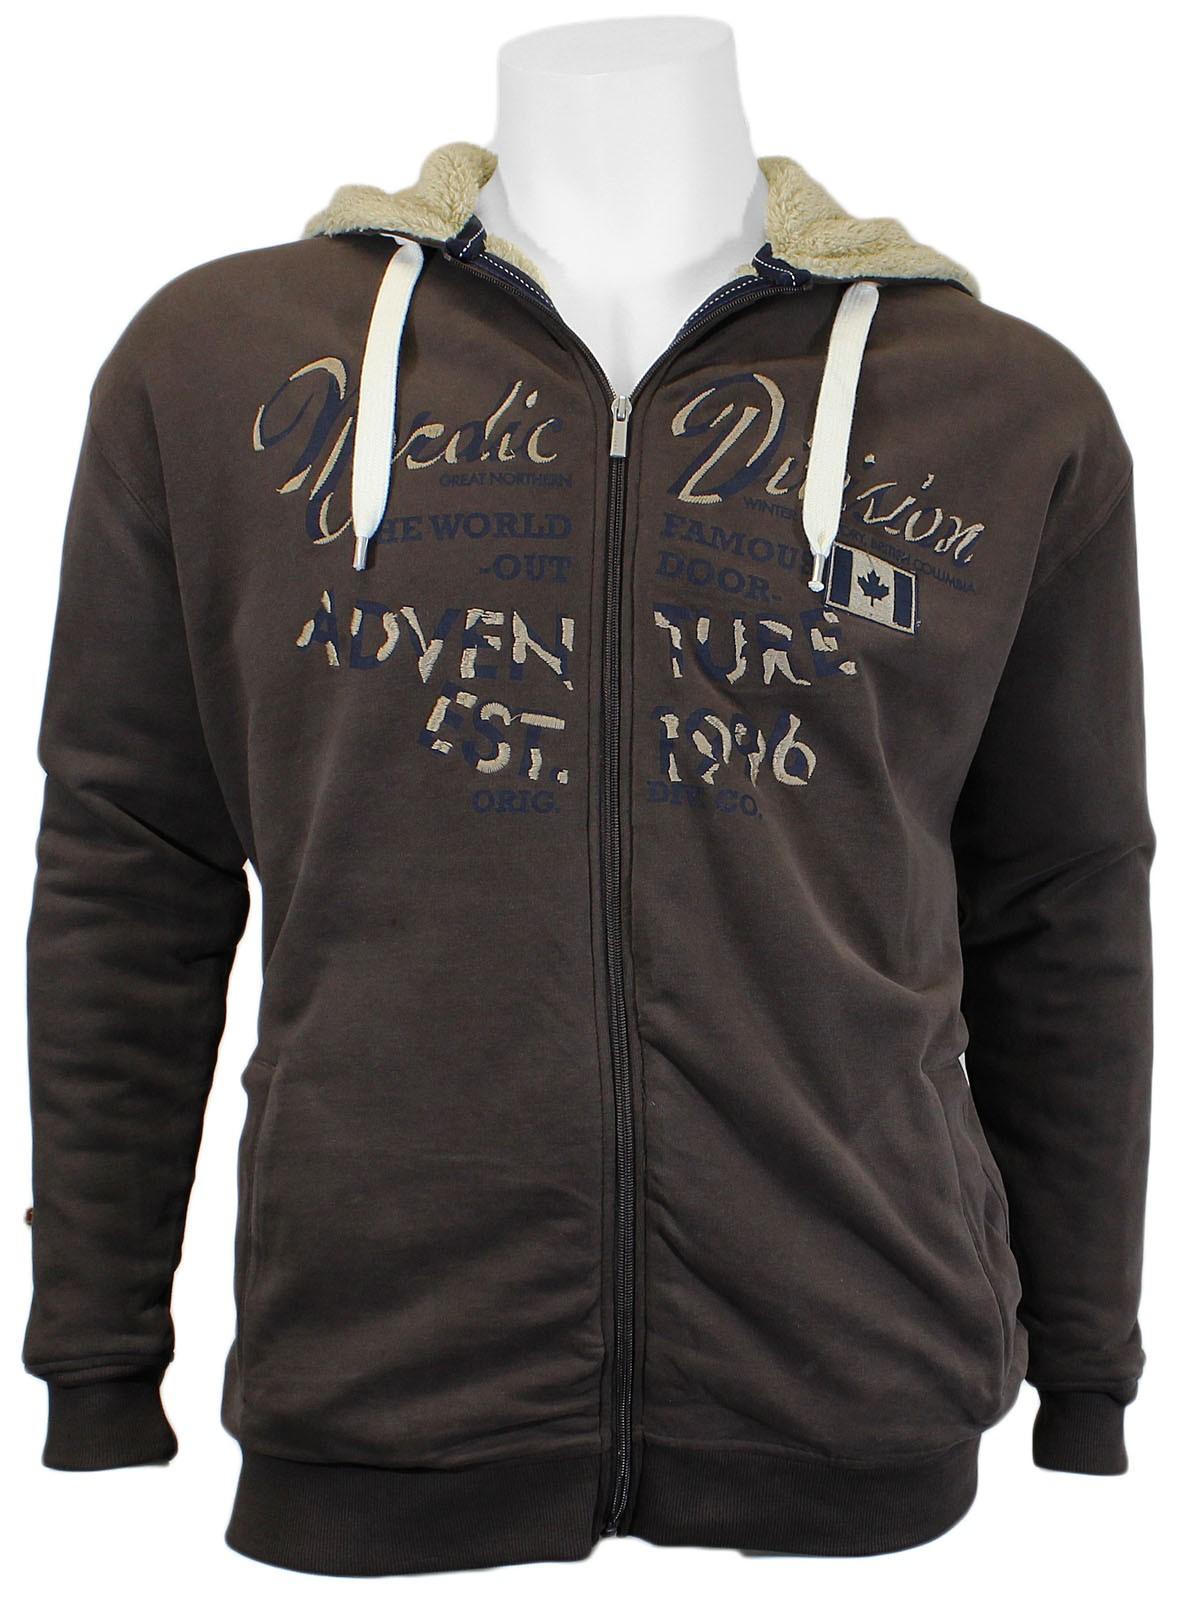 Sweatshirt jacke herren 4xl